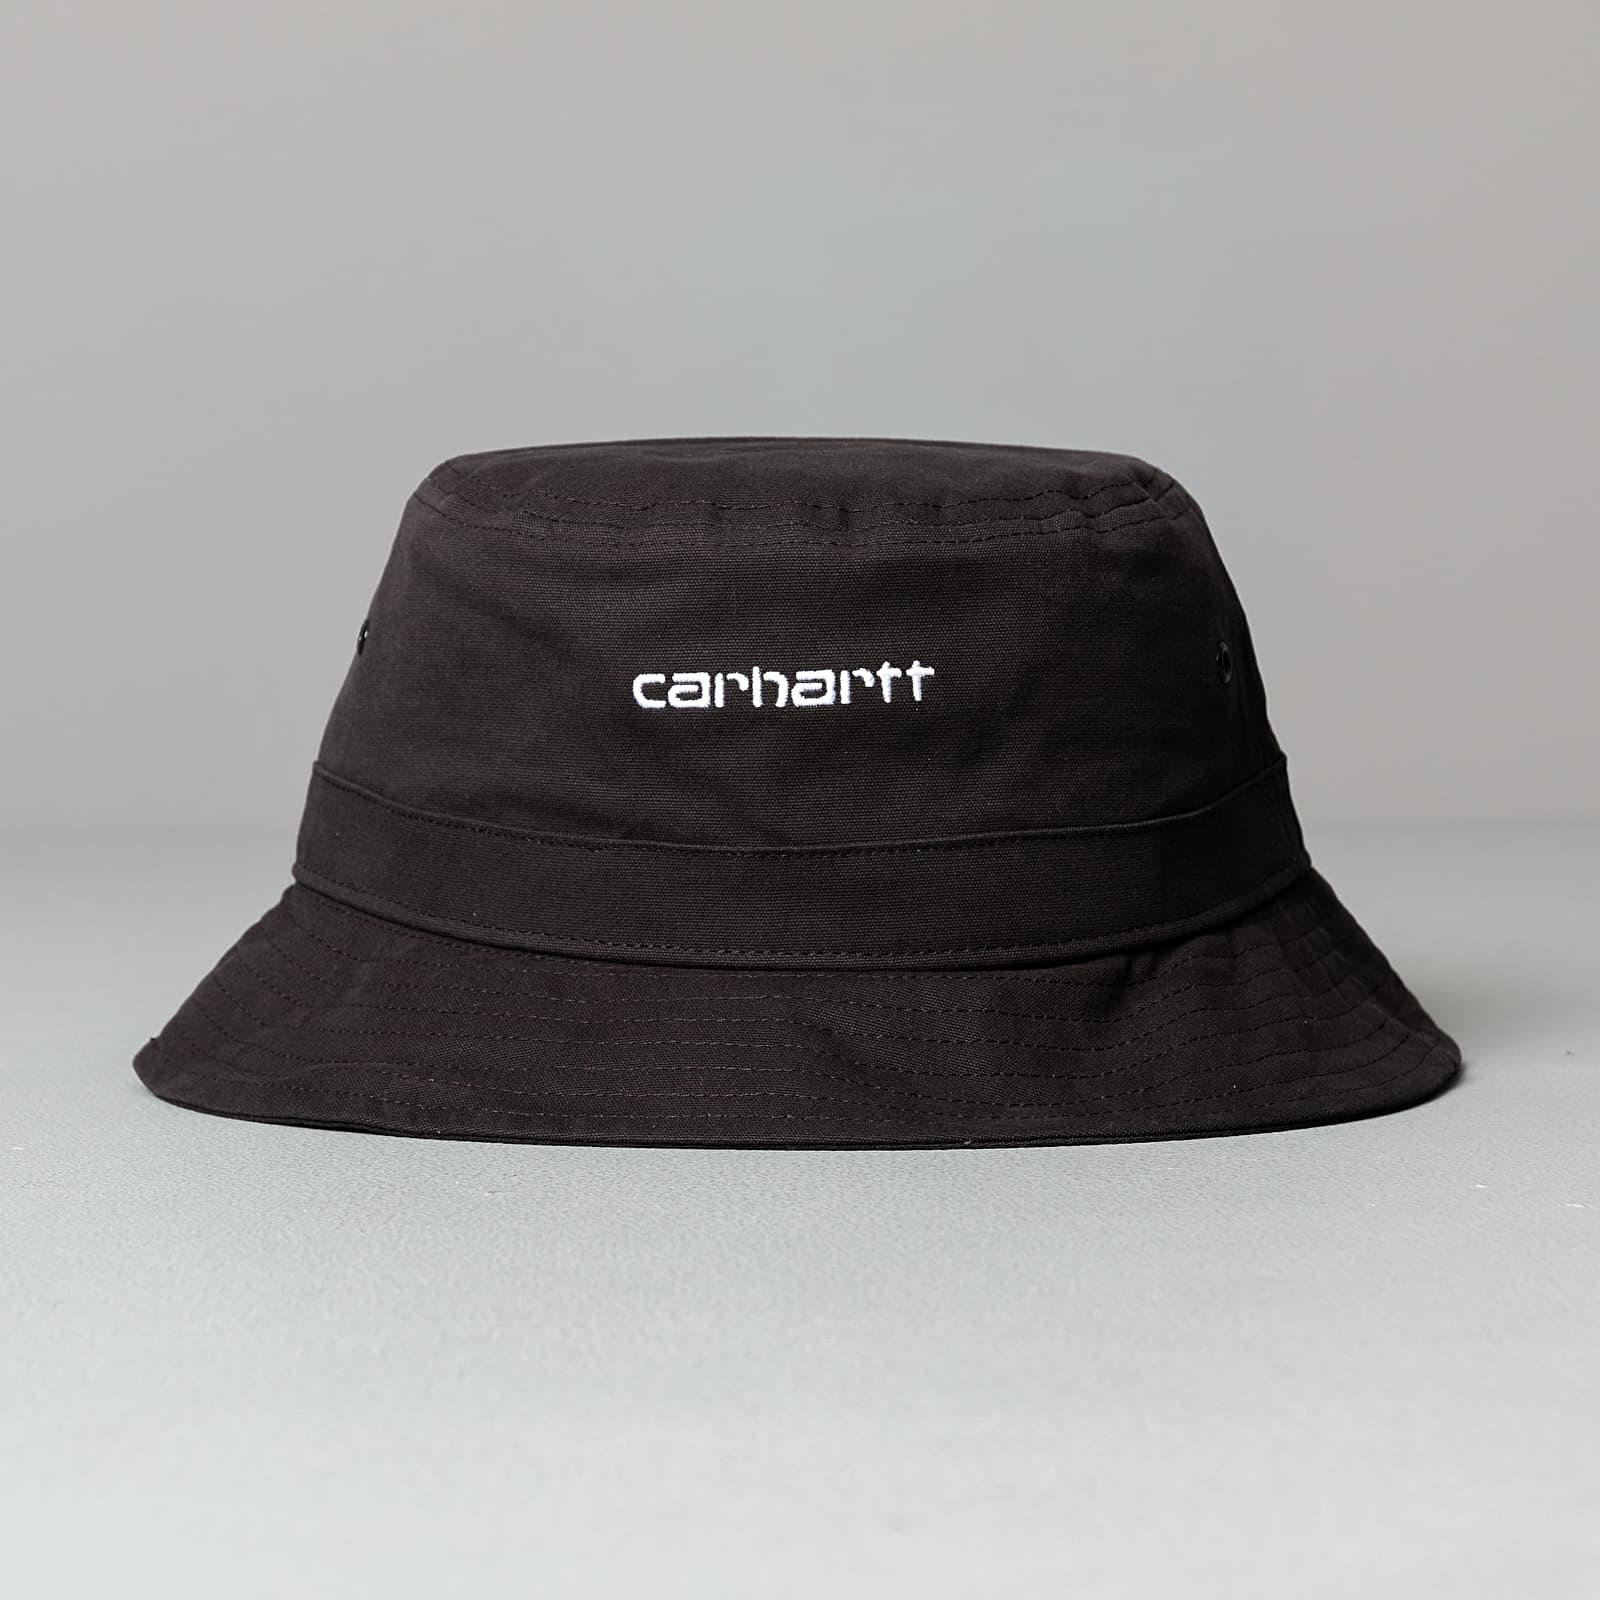 UNISEX HAT CARHARTT WIP SCRIPT BUCKET I026217 HAMILTON BROWN//BLACK